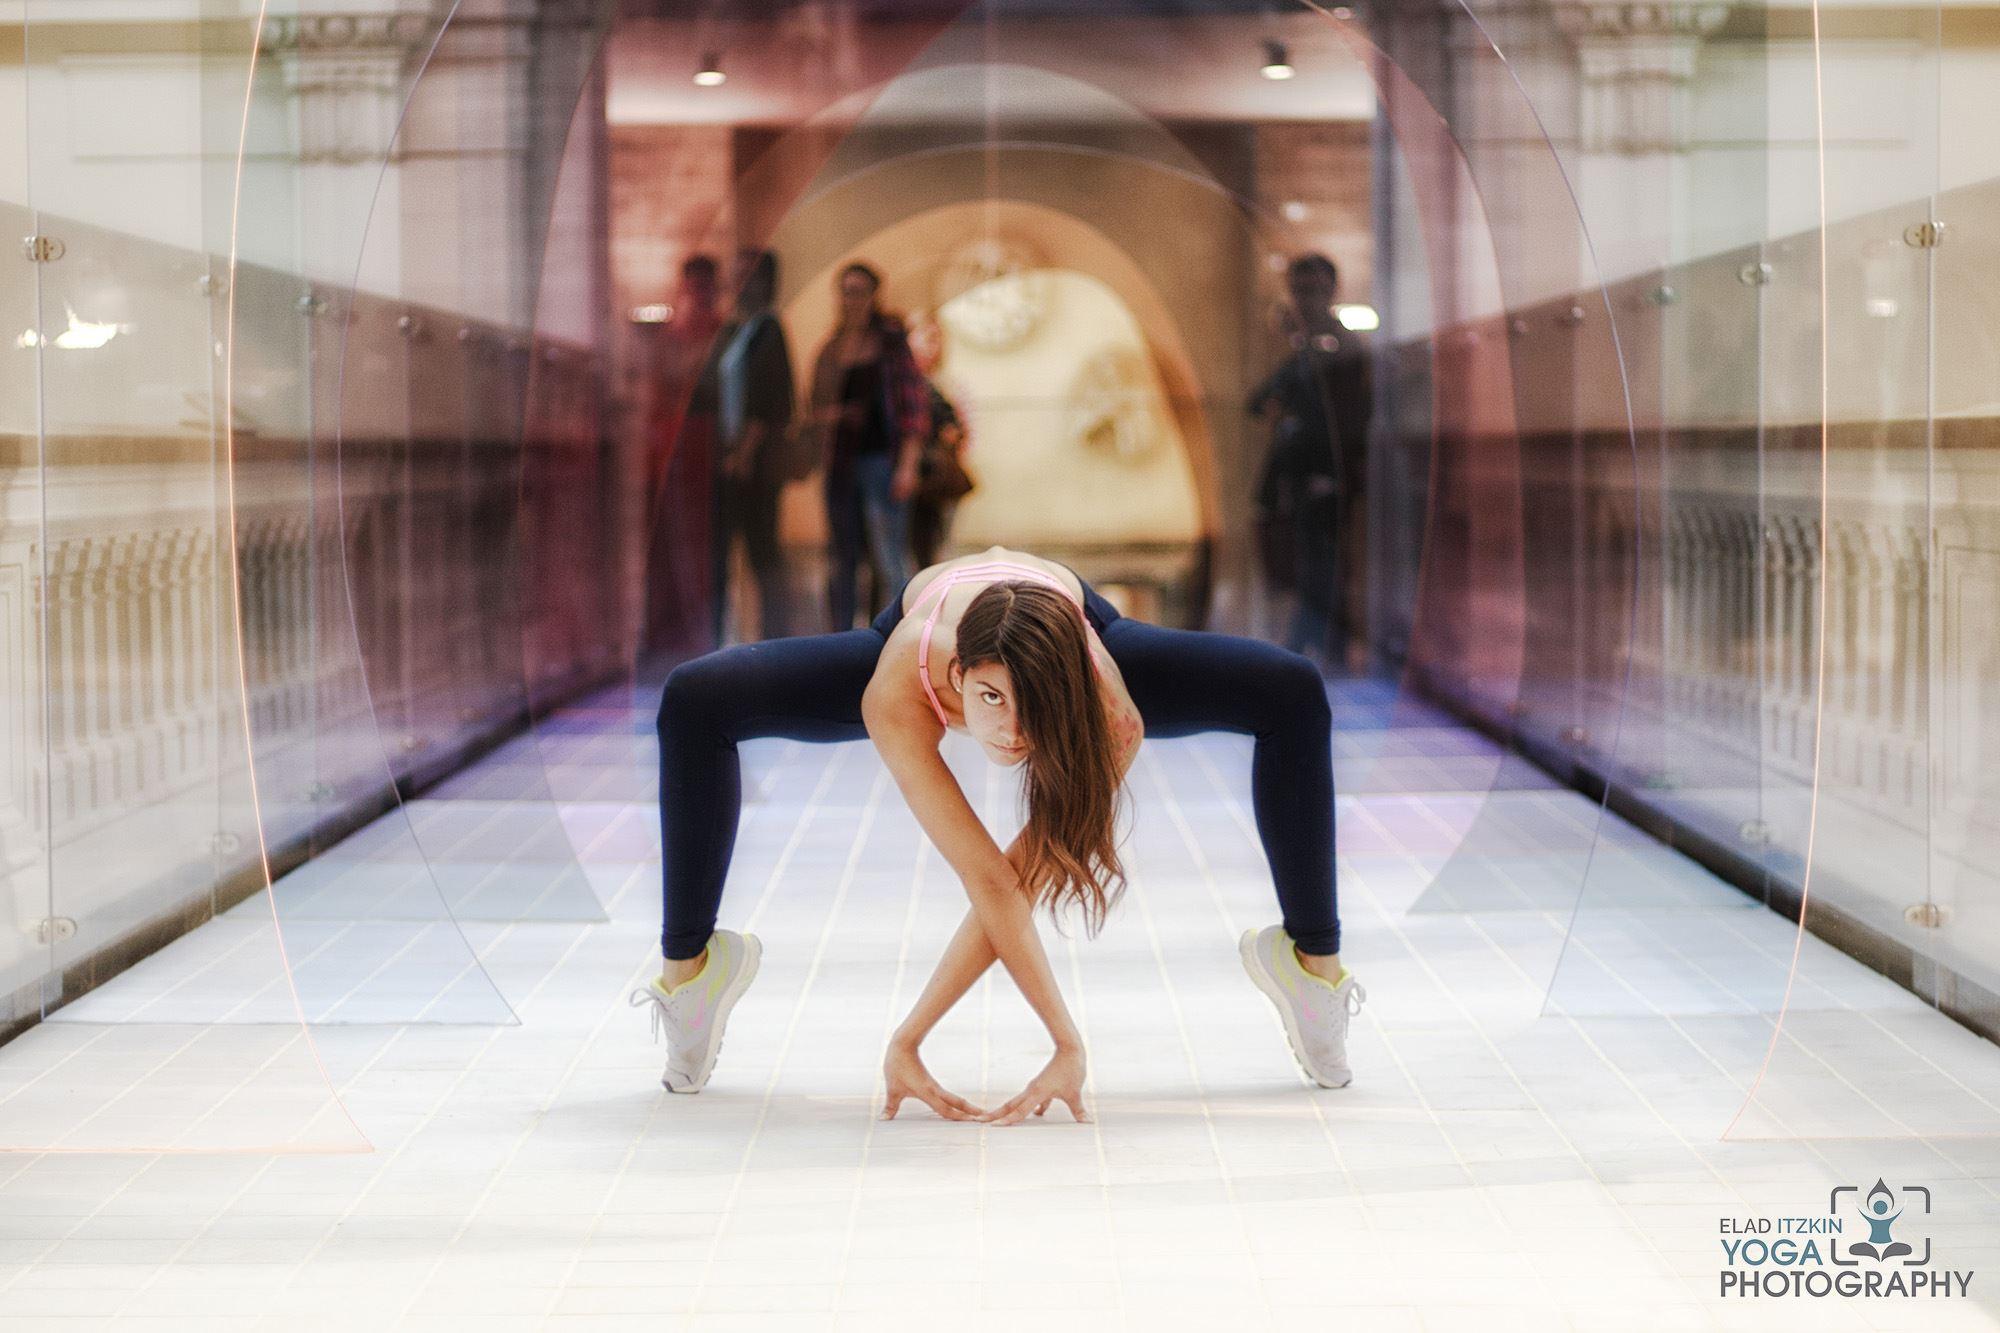 Elad Itzkin Yoga Photography - Poleen d'Athis - 6542